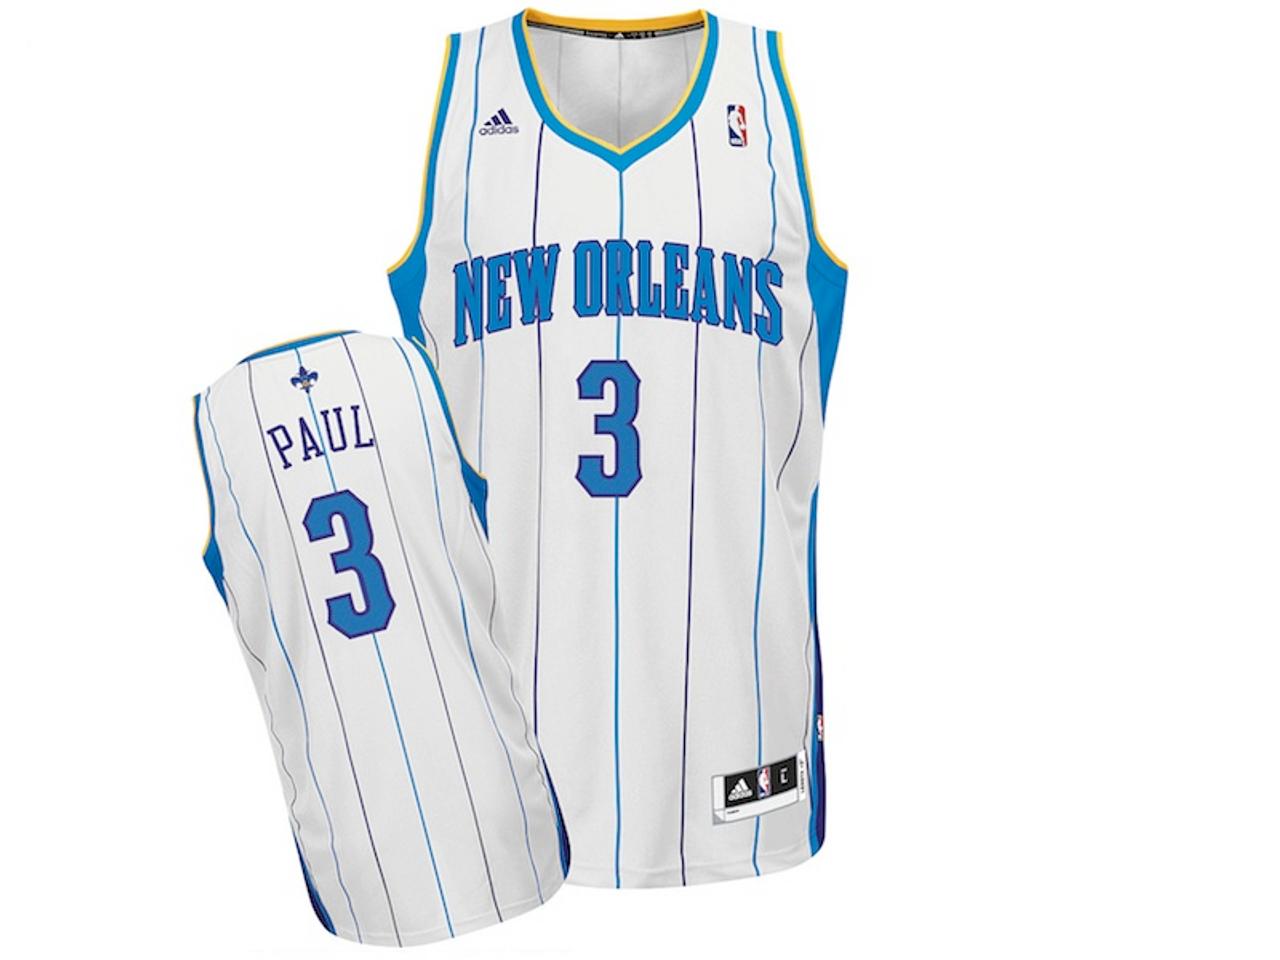 outlet store 7c1eb 190ee Charlotte Hornets Chris Paul Home White Adidas Swingman ...